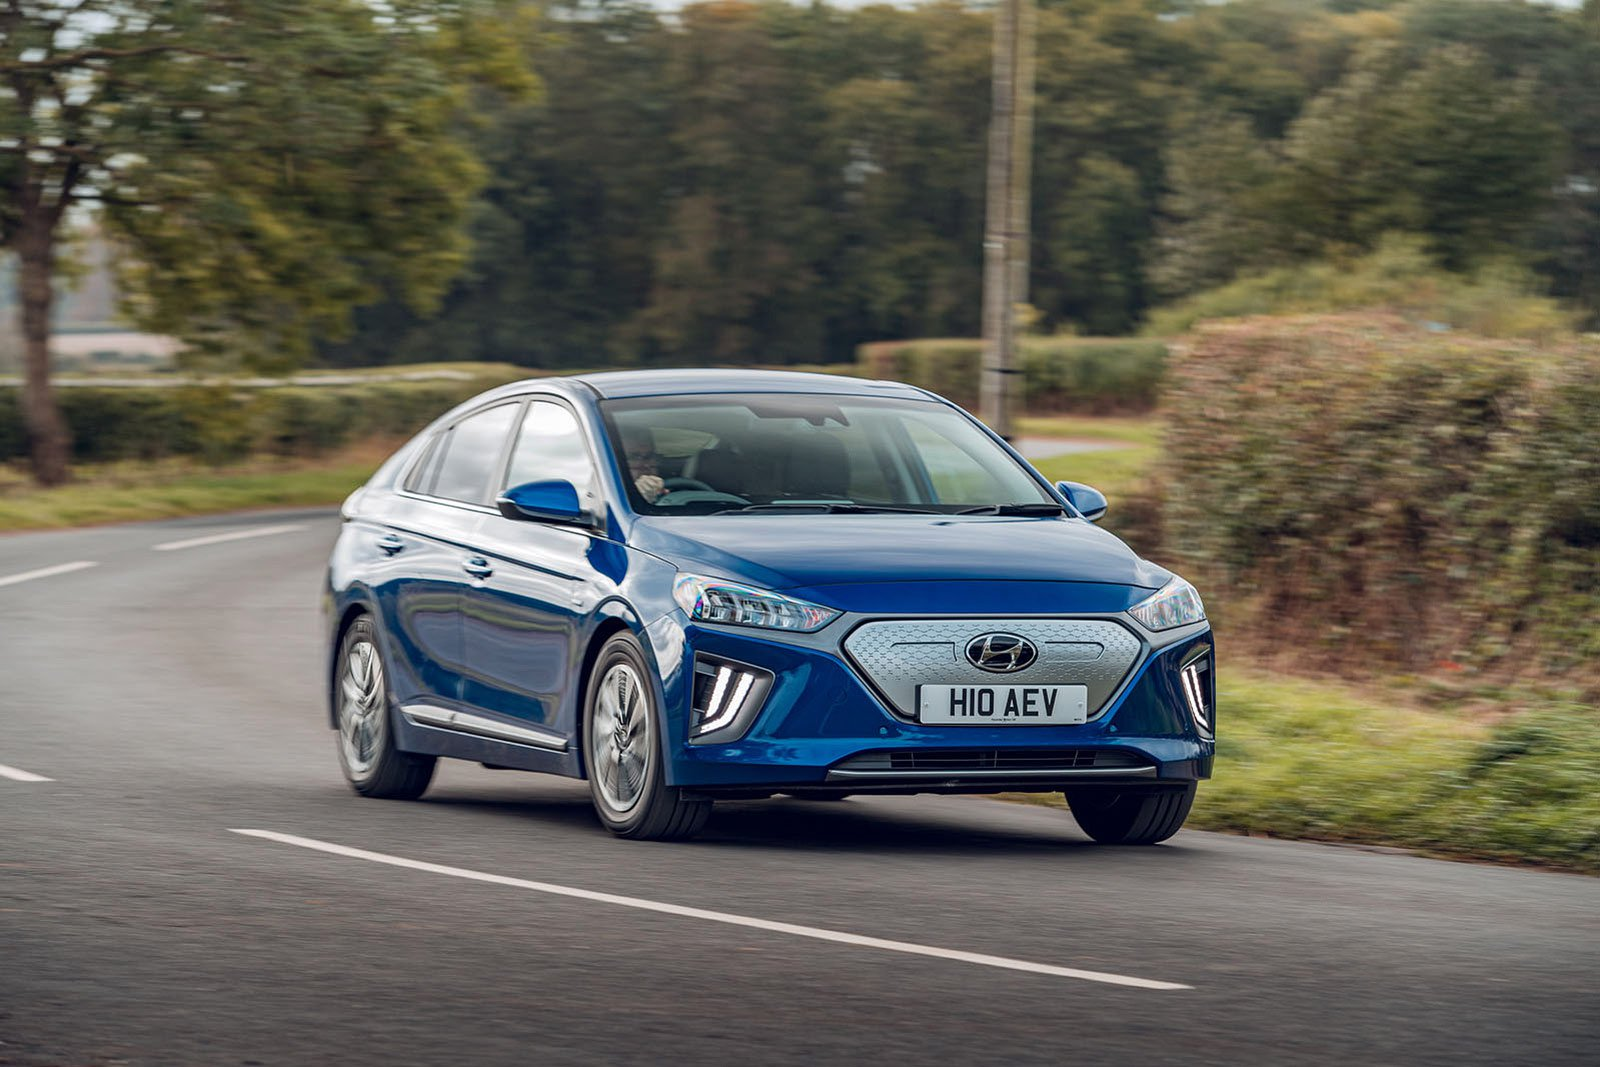 Hyundai Ioniq Electric front three quarters